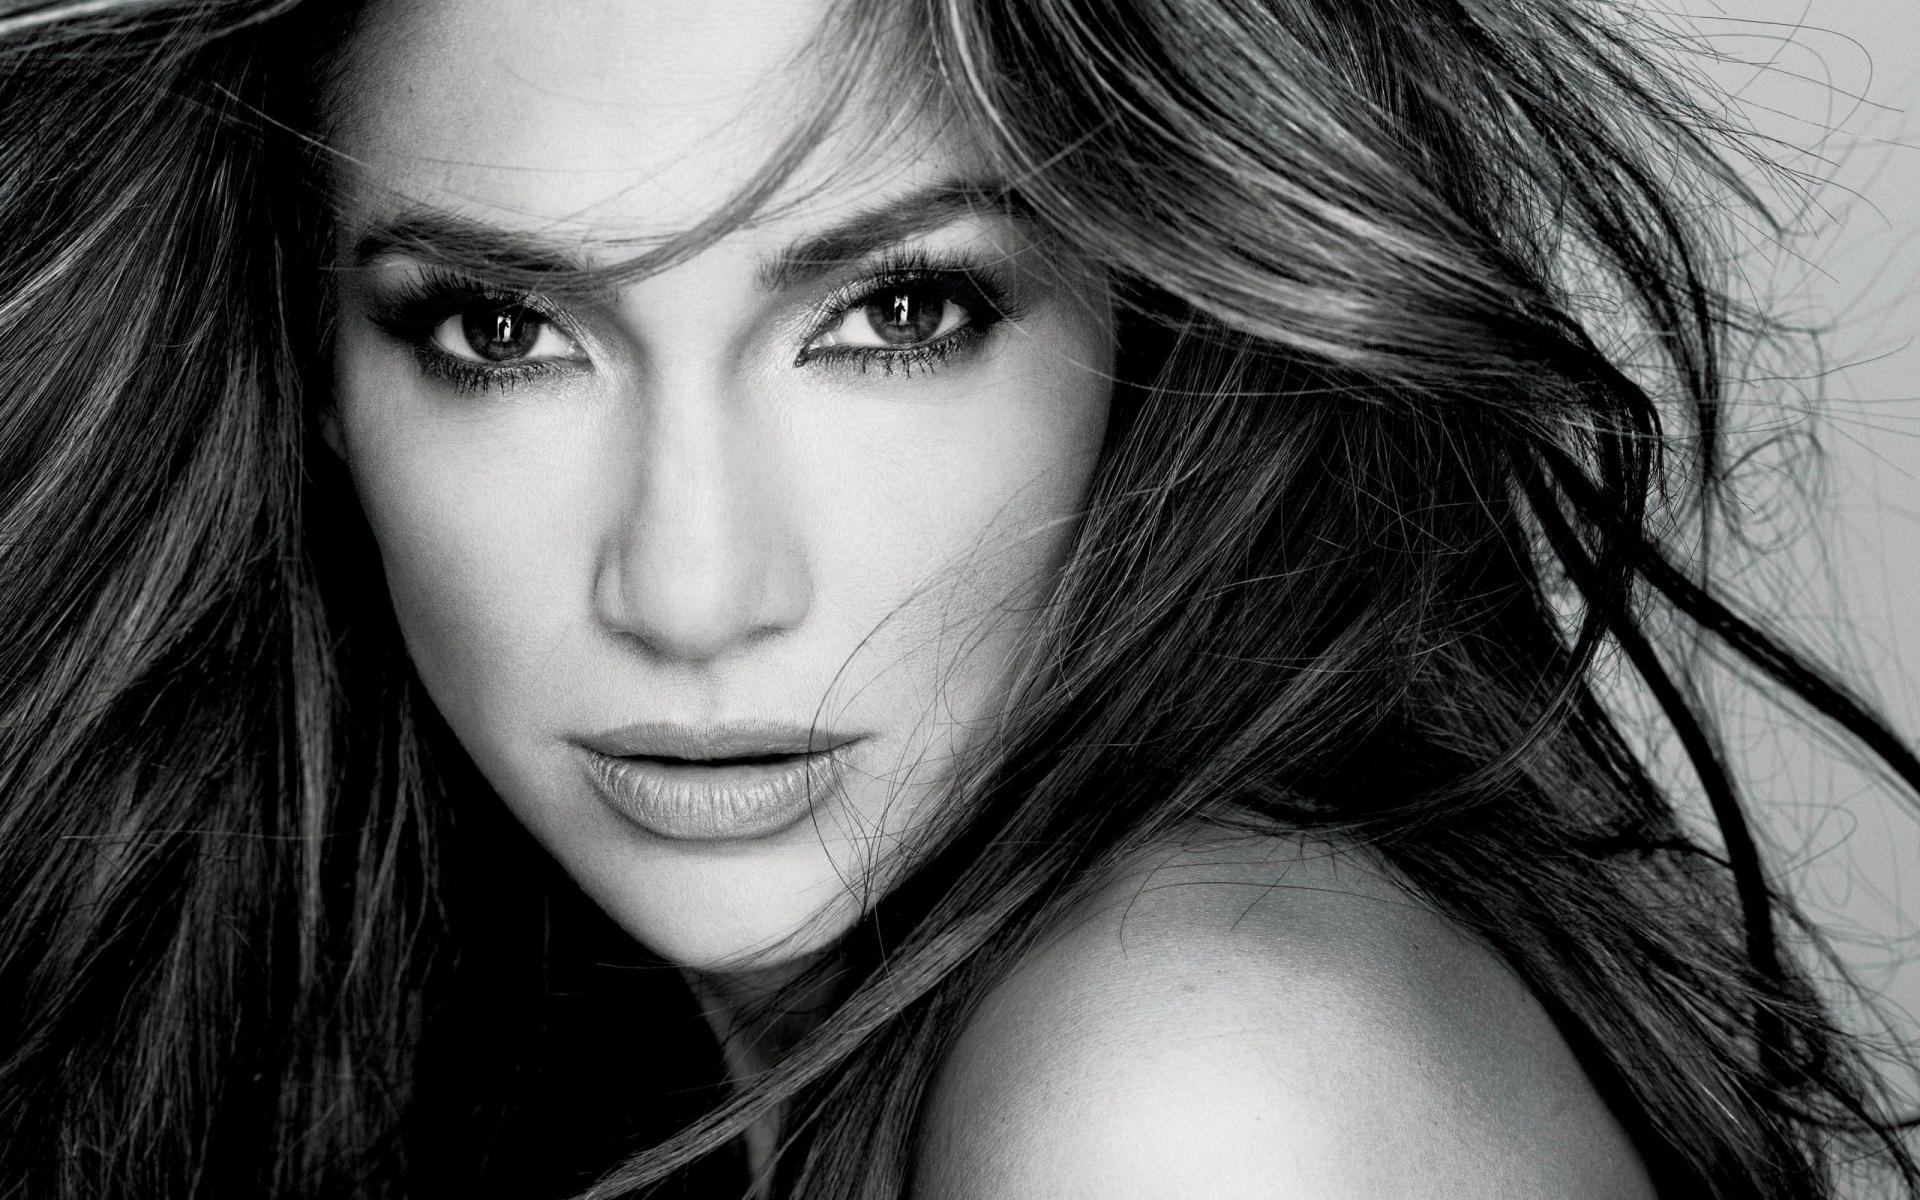 Jennifer Lopez Wallpapers 2015 1920x1200